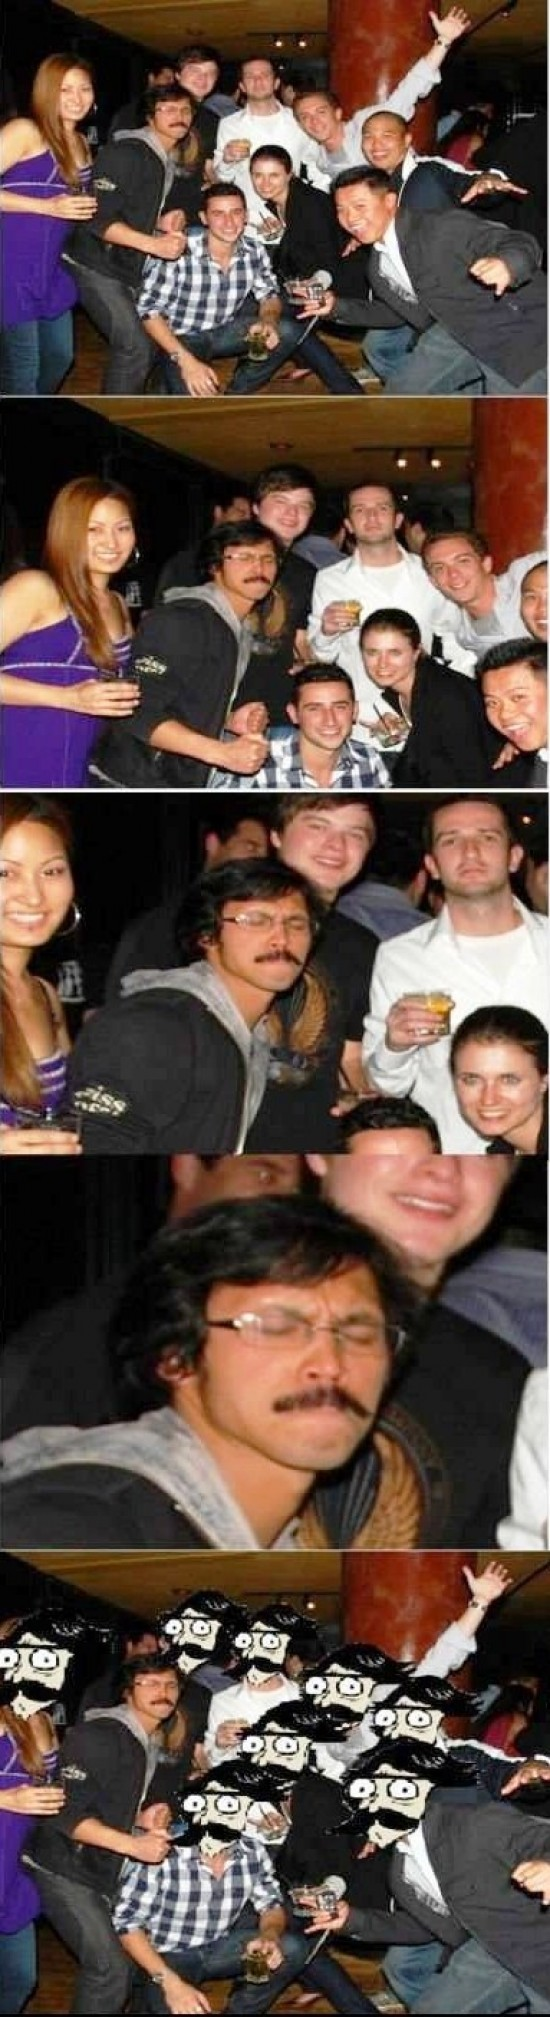 face swap,foto de grupo,stare dad de joven